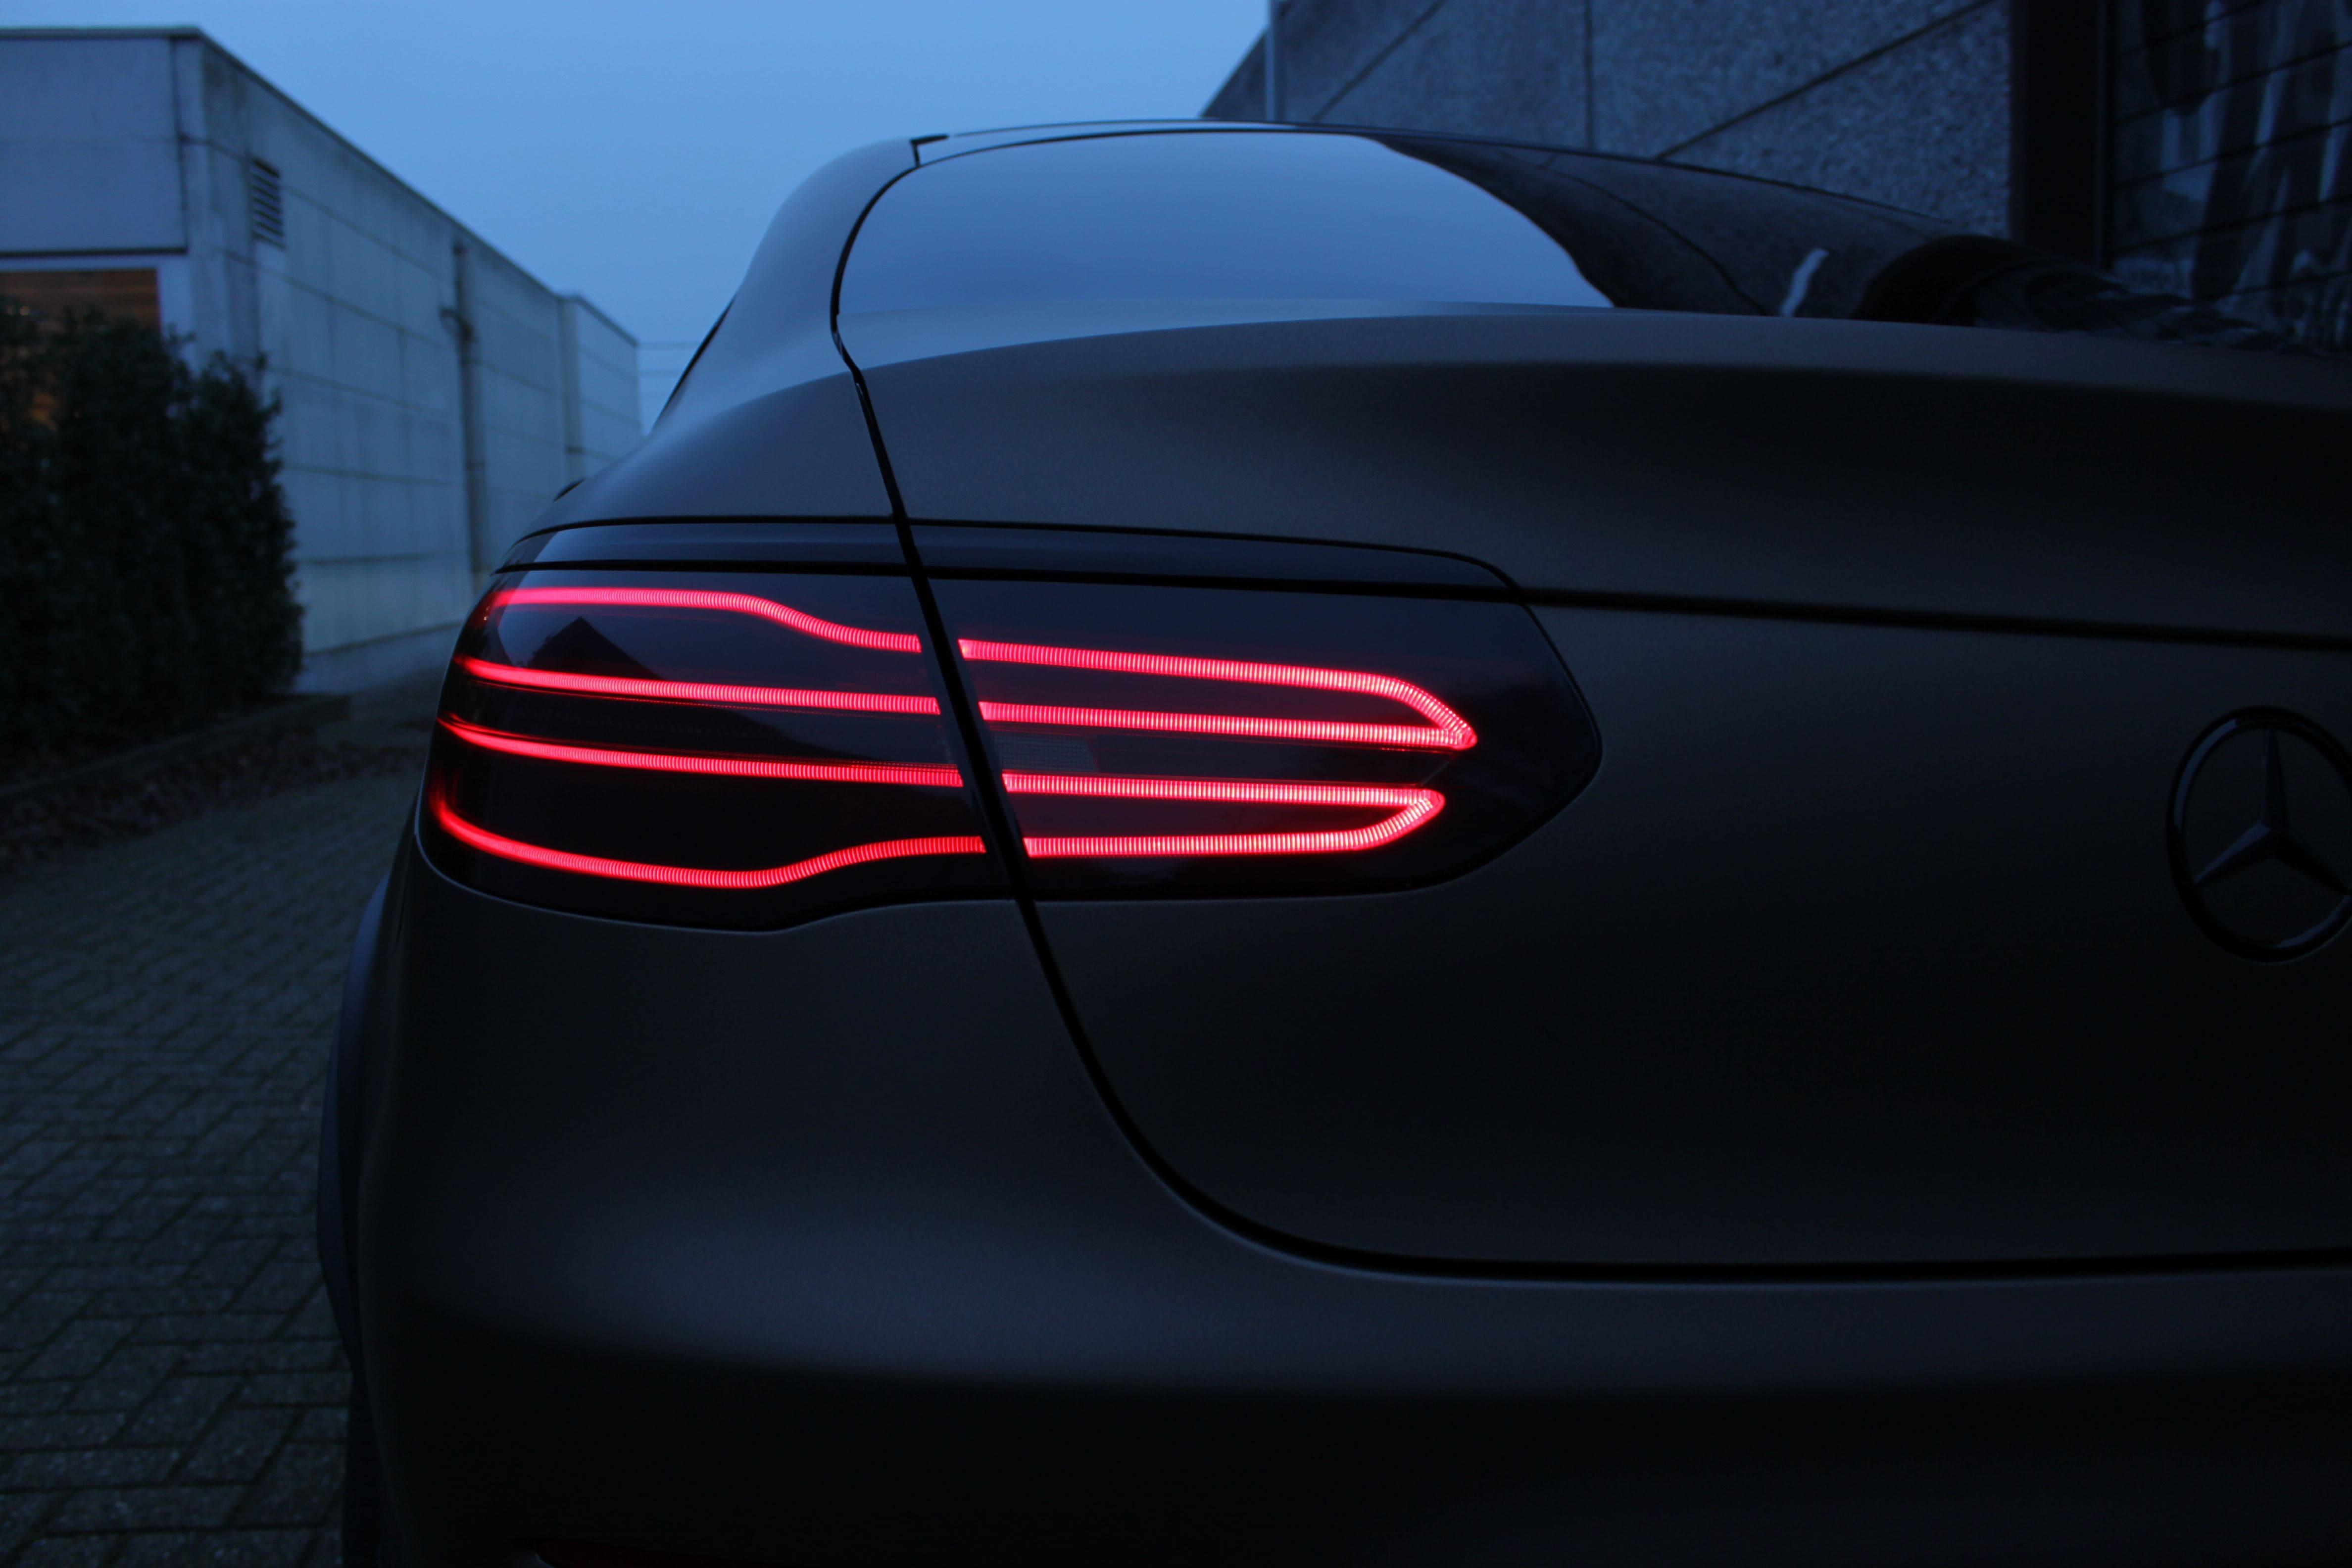 Mercedes GLC Coupe Matte metallic brown, Carwrapping door Wrapmyride.nu Foto-nr:9349, ©2021